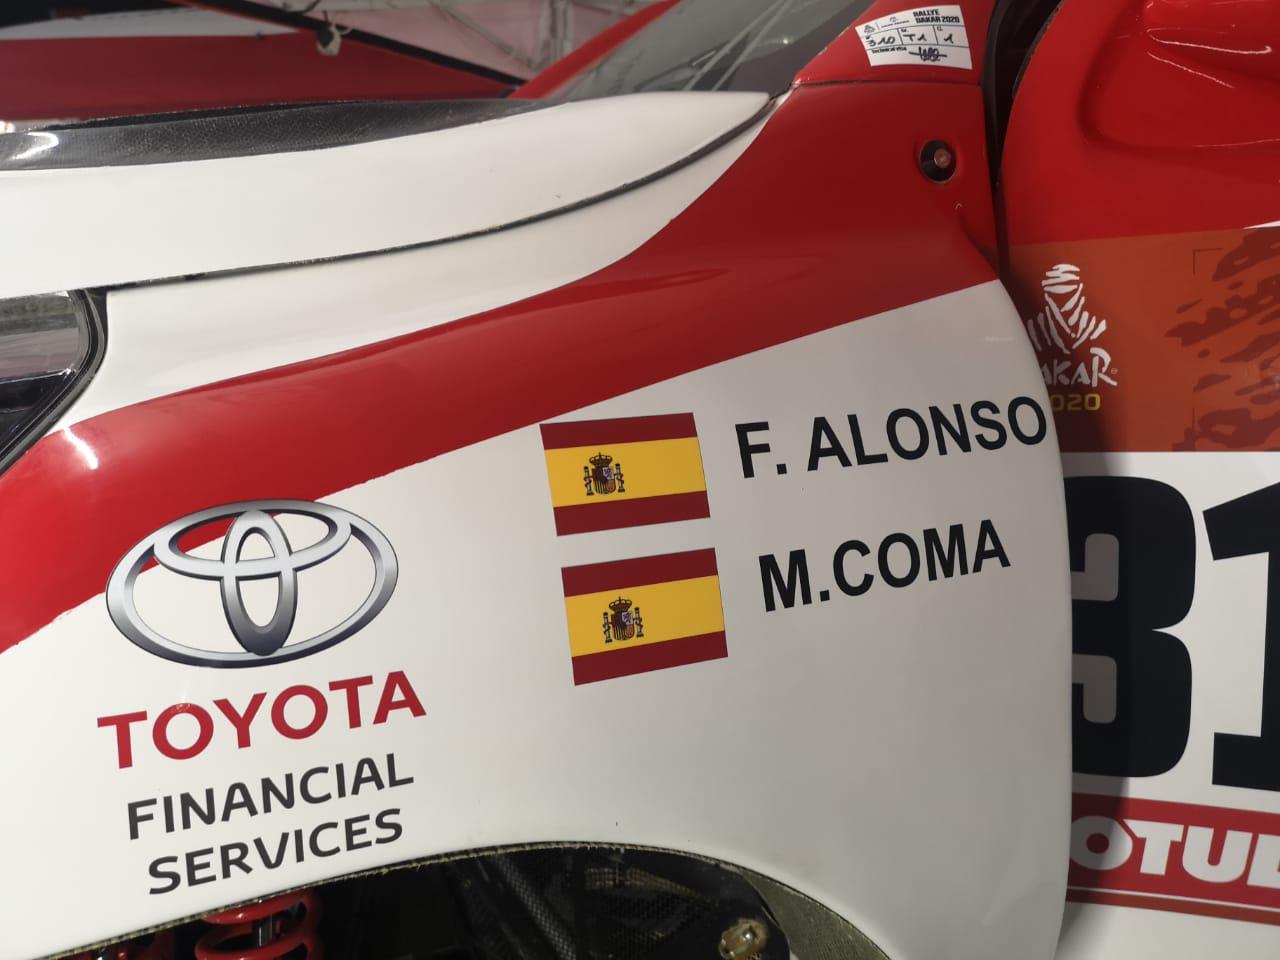 Bandit proud to be associated with Toyota Gazoo Racing team at Dakar 2020